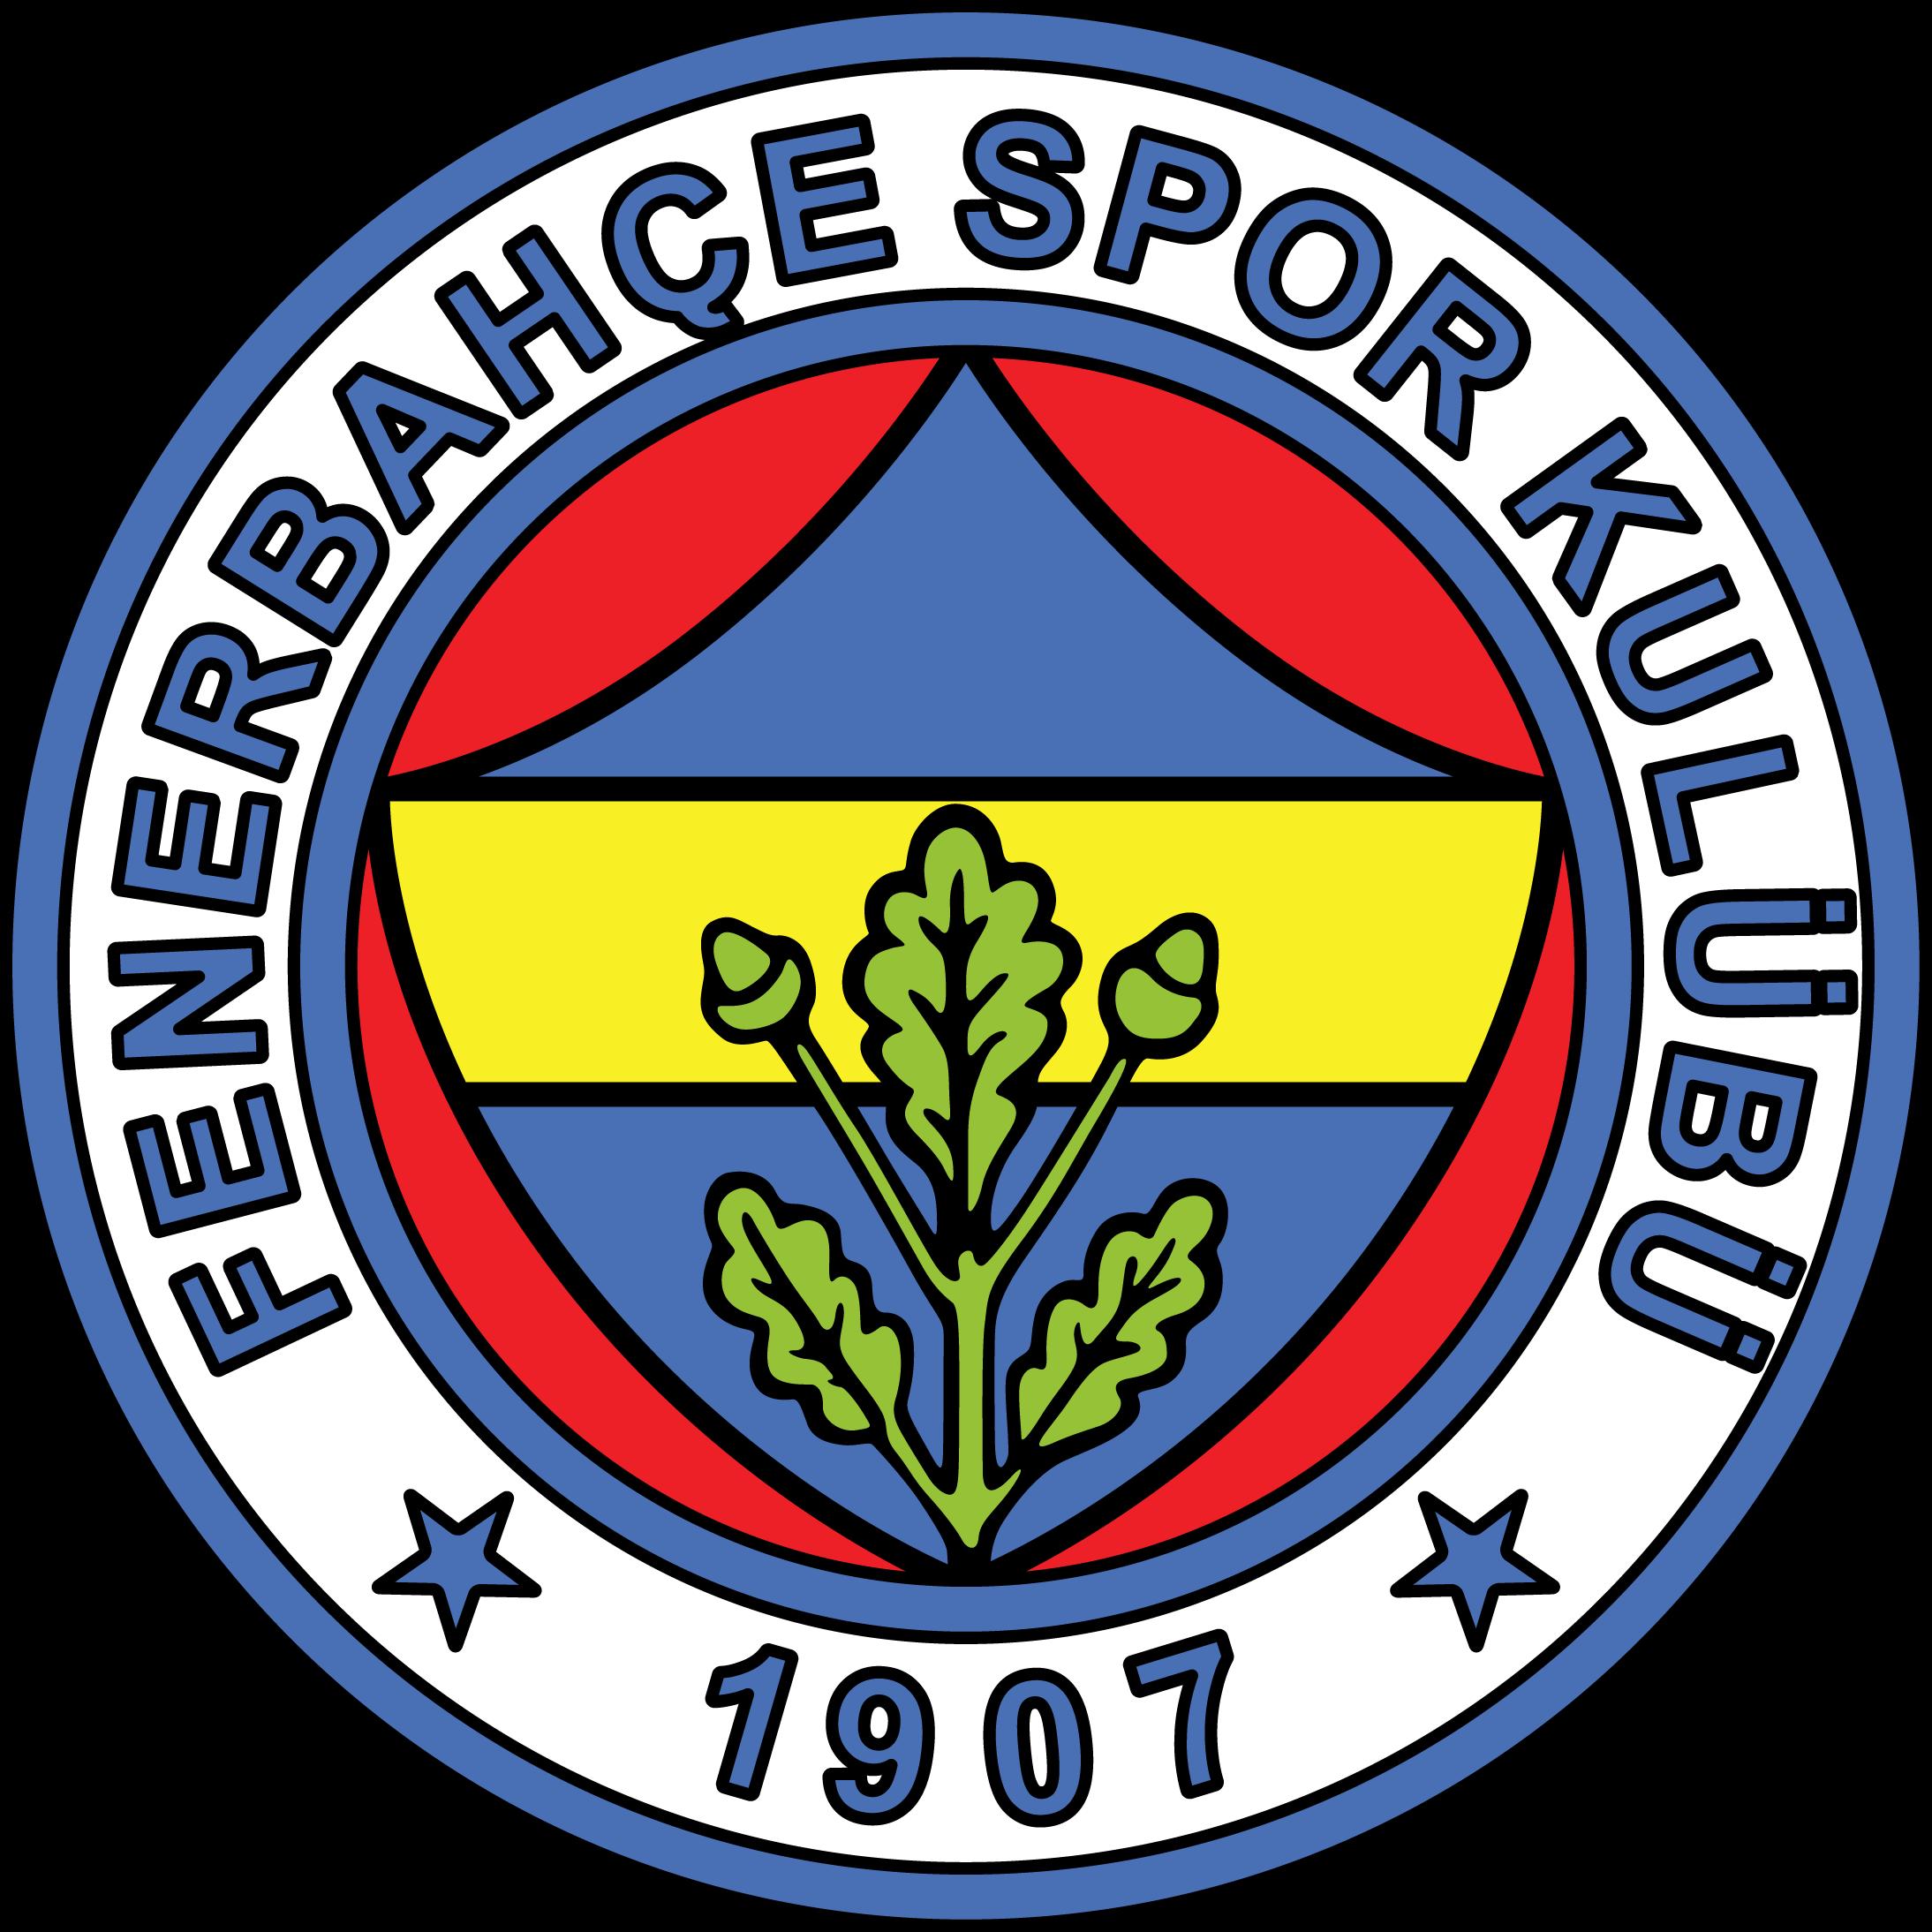 Football Logos Panosundaki Pin